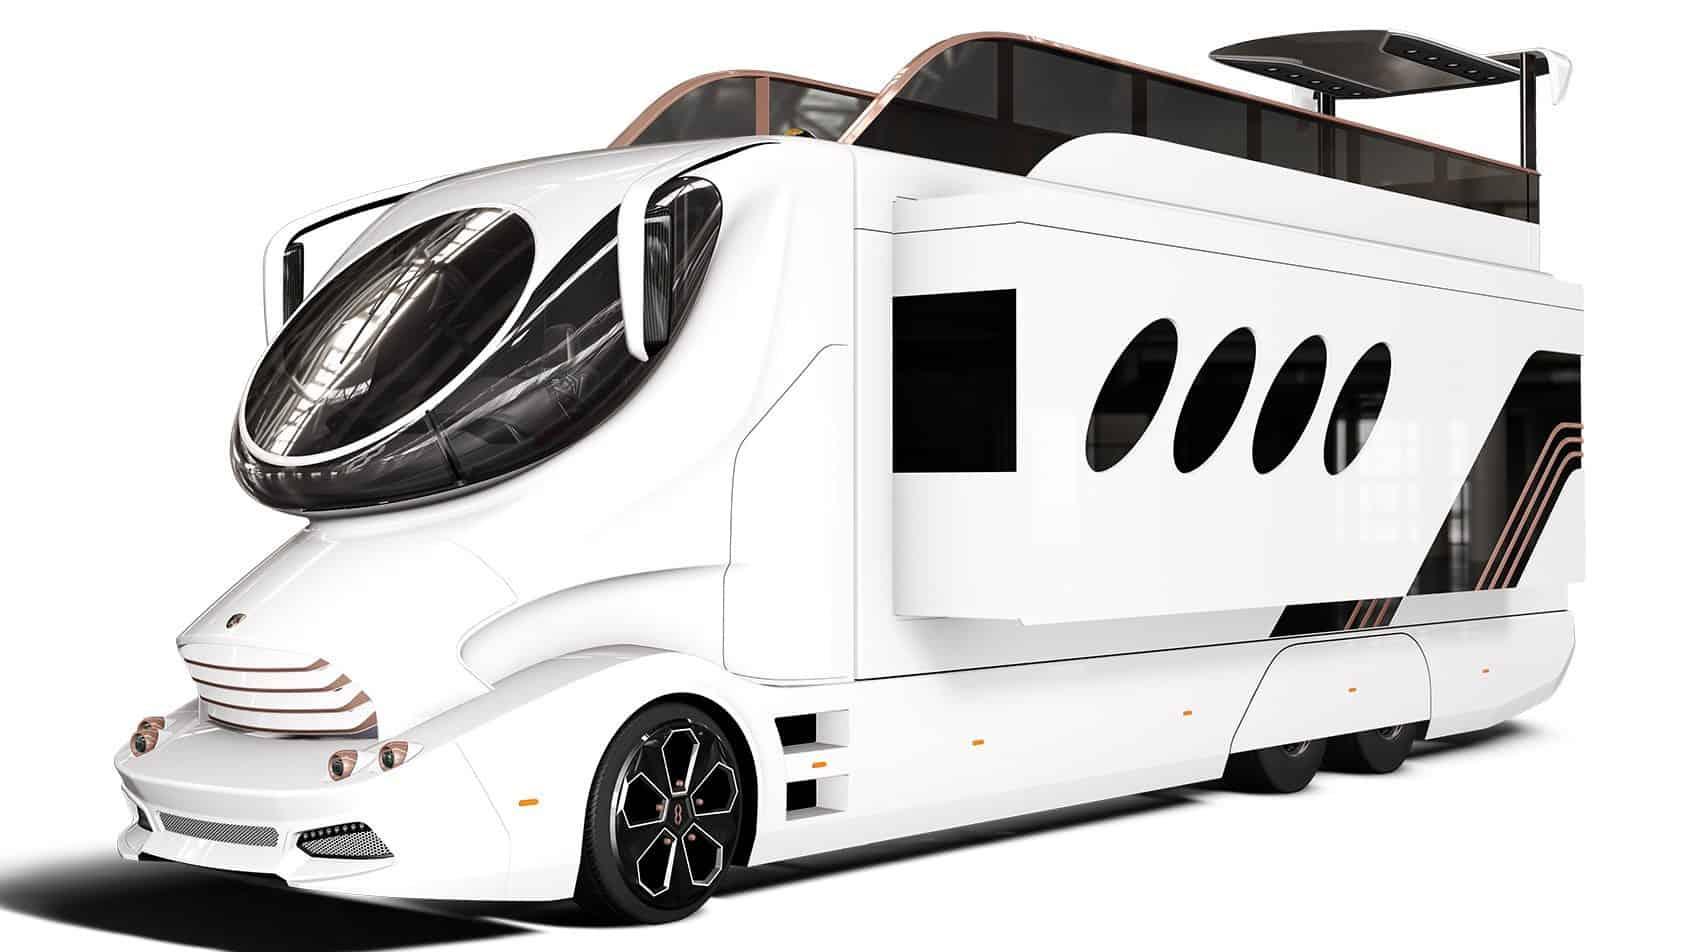 Most Expensive RVs - Marchi Mobile EleMMent Palazzo - $3 million